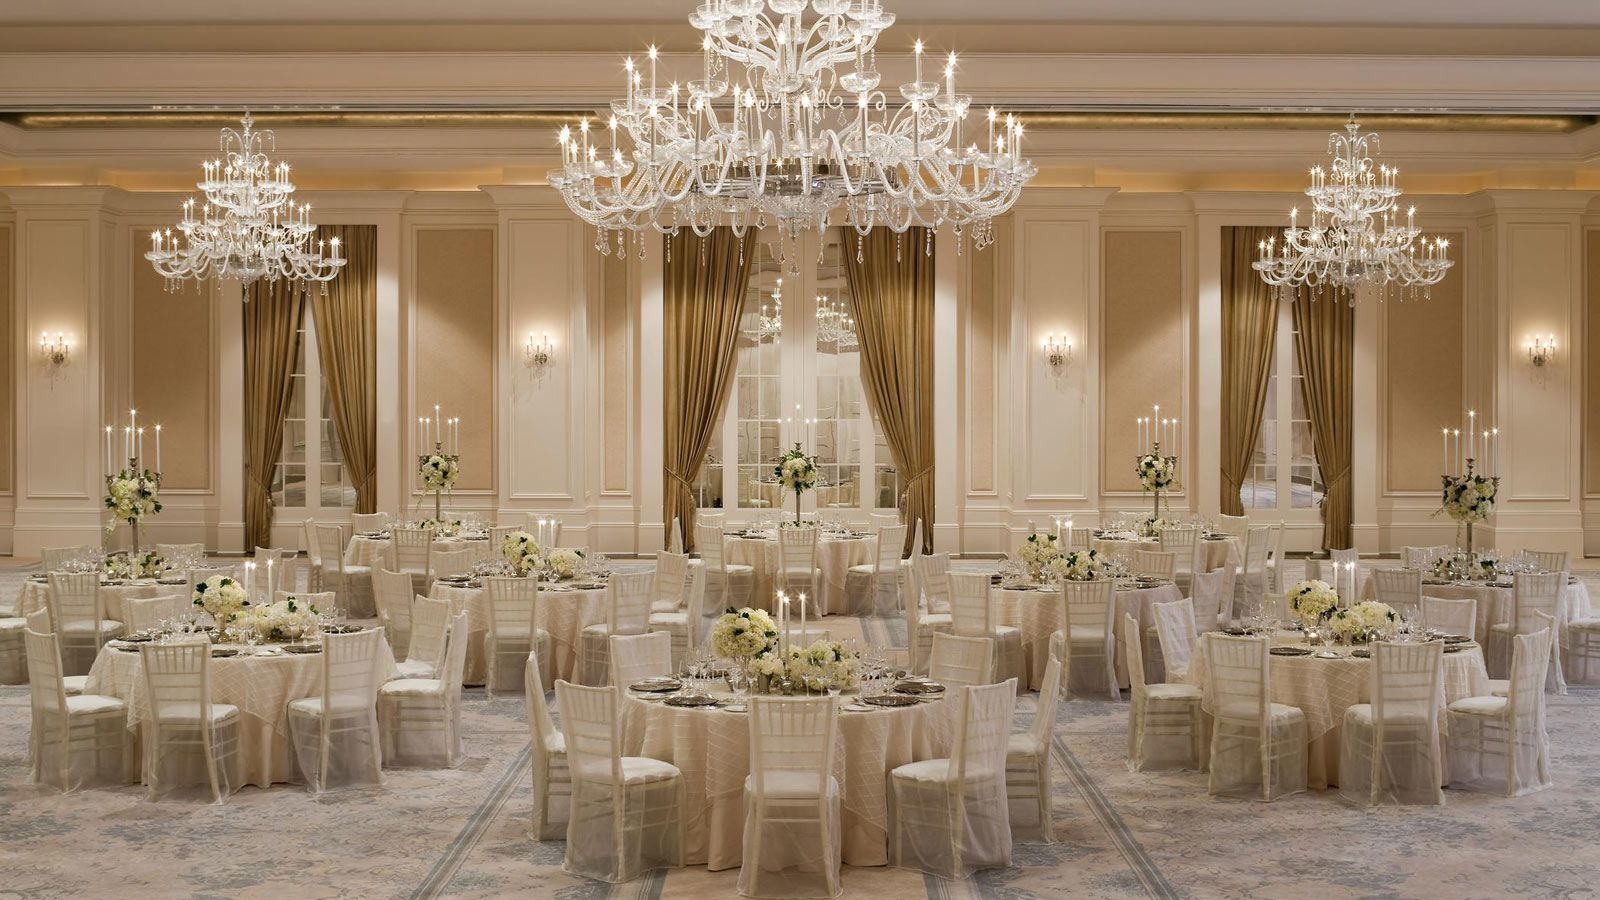 majestic grand ballroom   Atlanta Meeting Space & Events ...